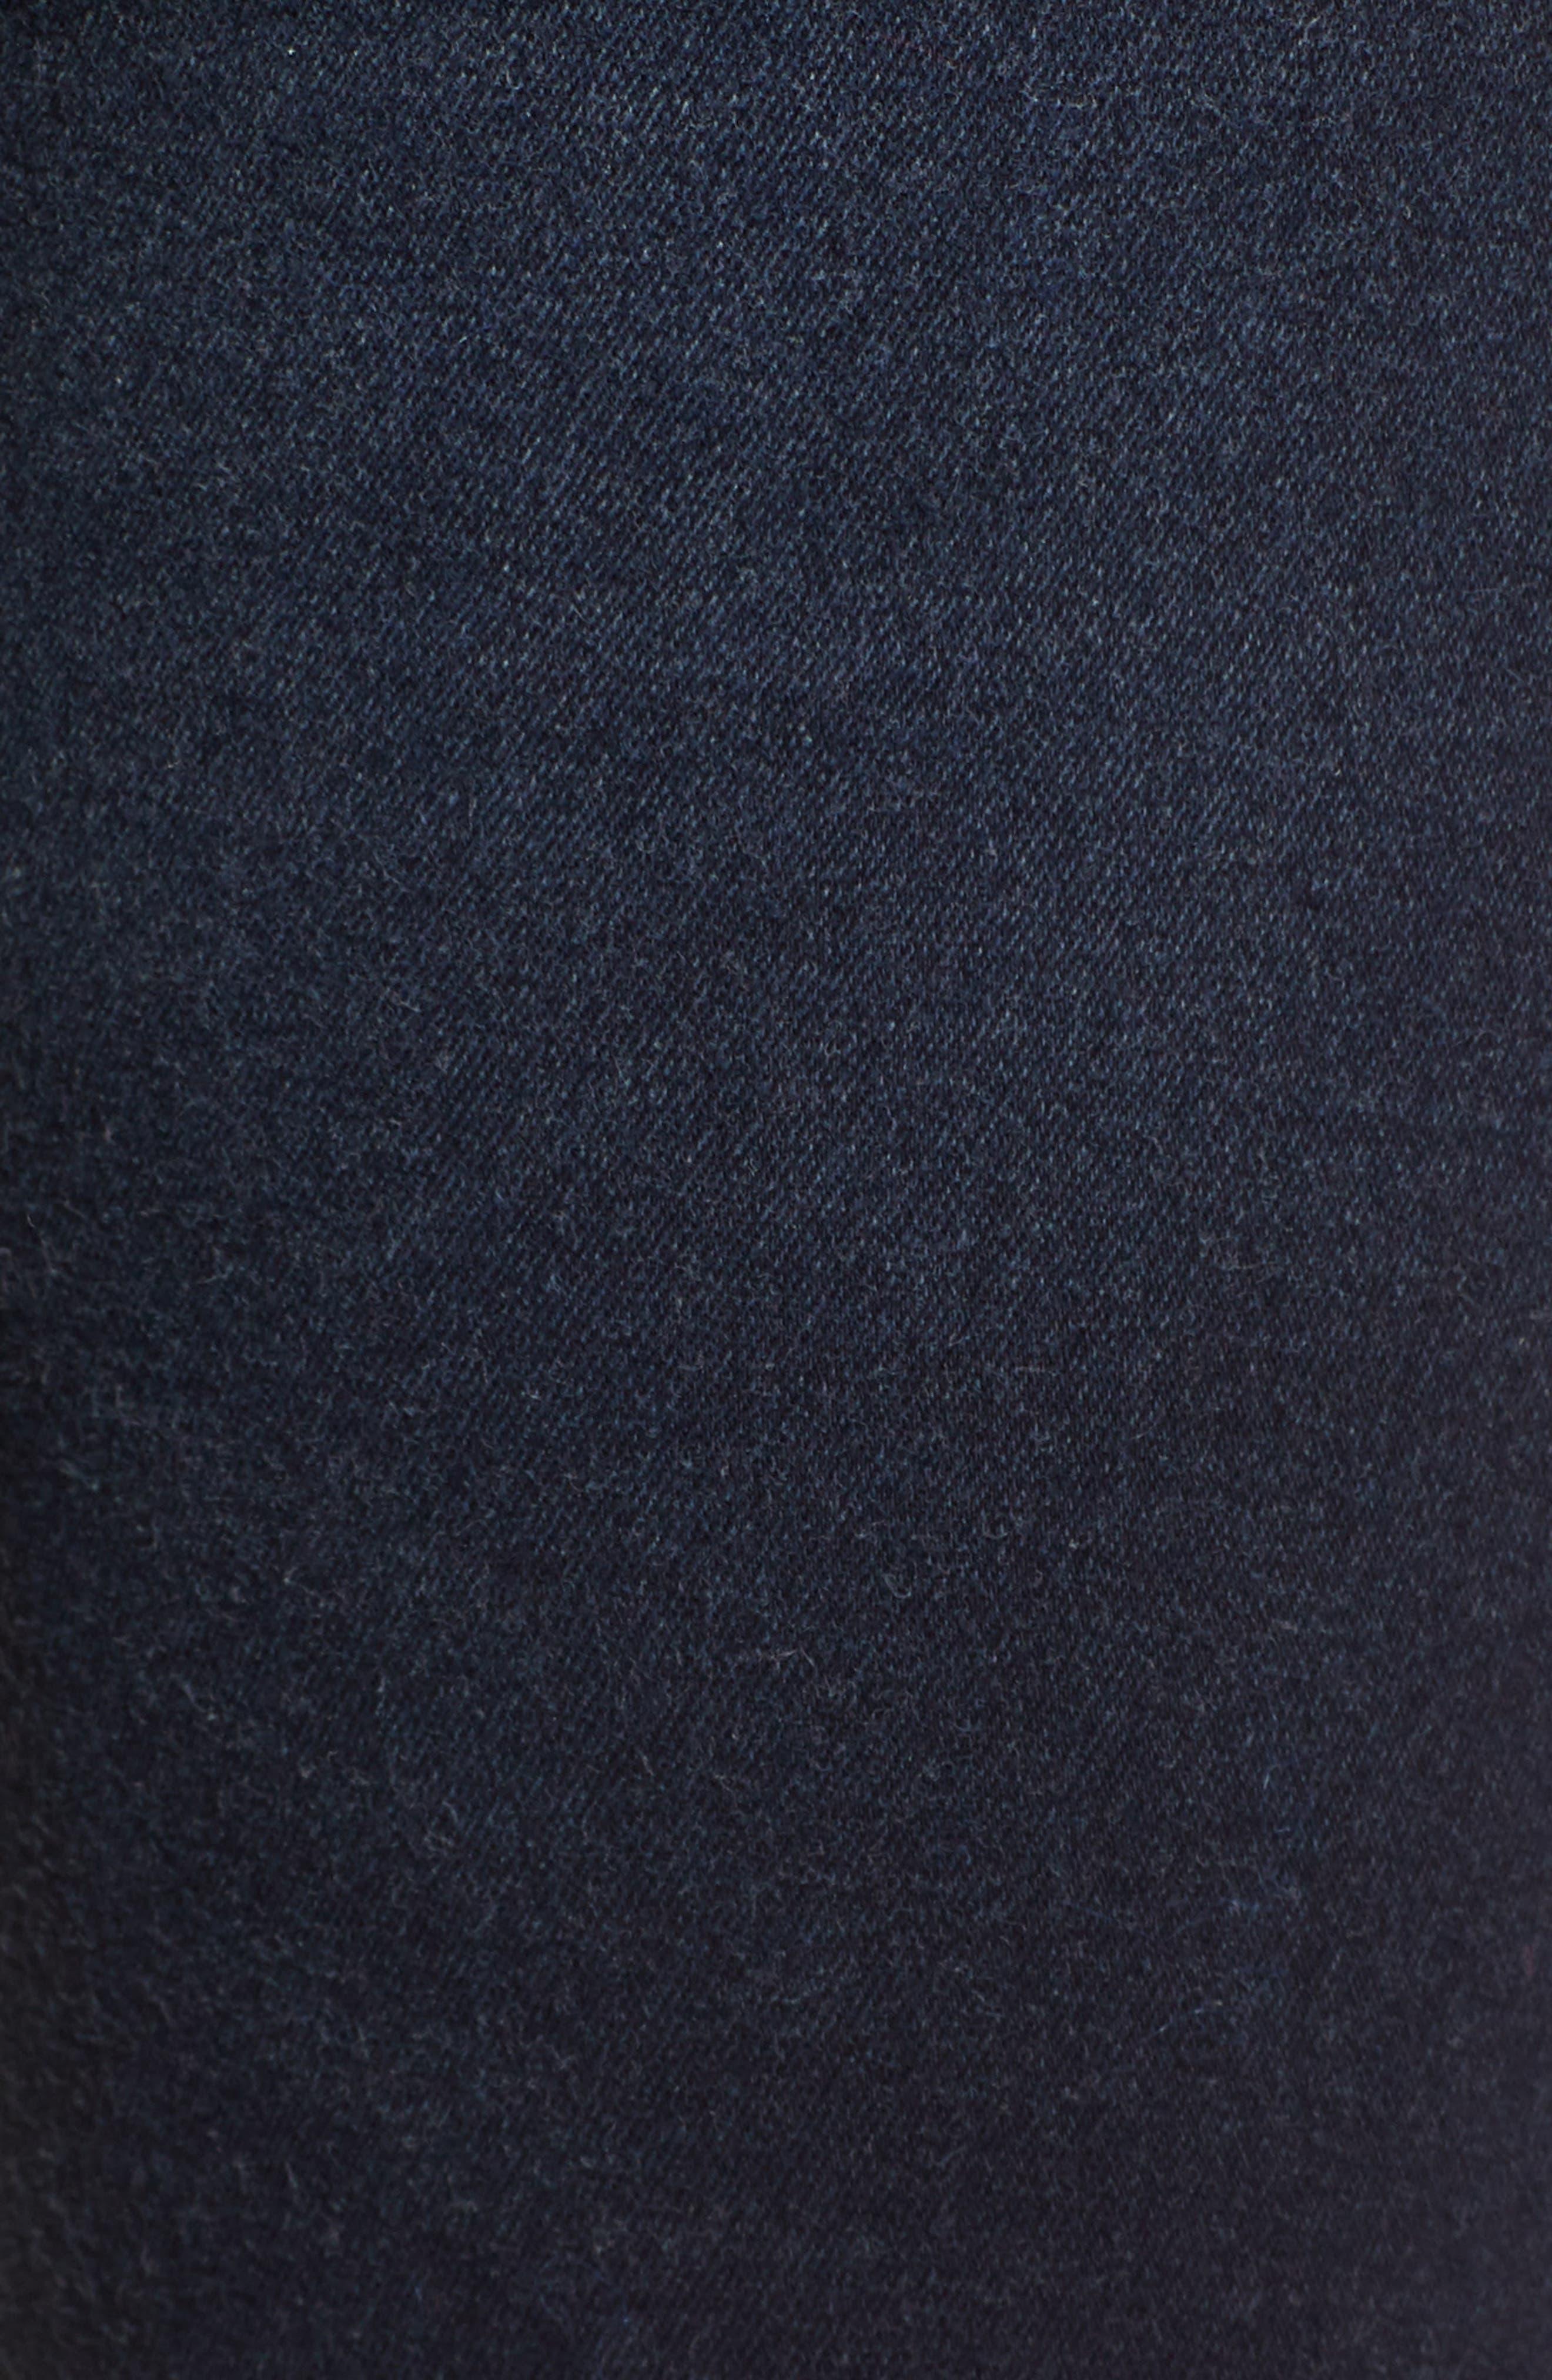 Moxy Skinny Jeans,                             Alternate thumbnail 6, color,                             PITCH DARK BLUE